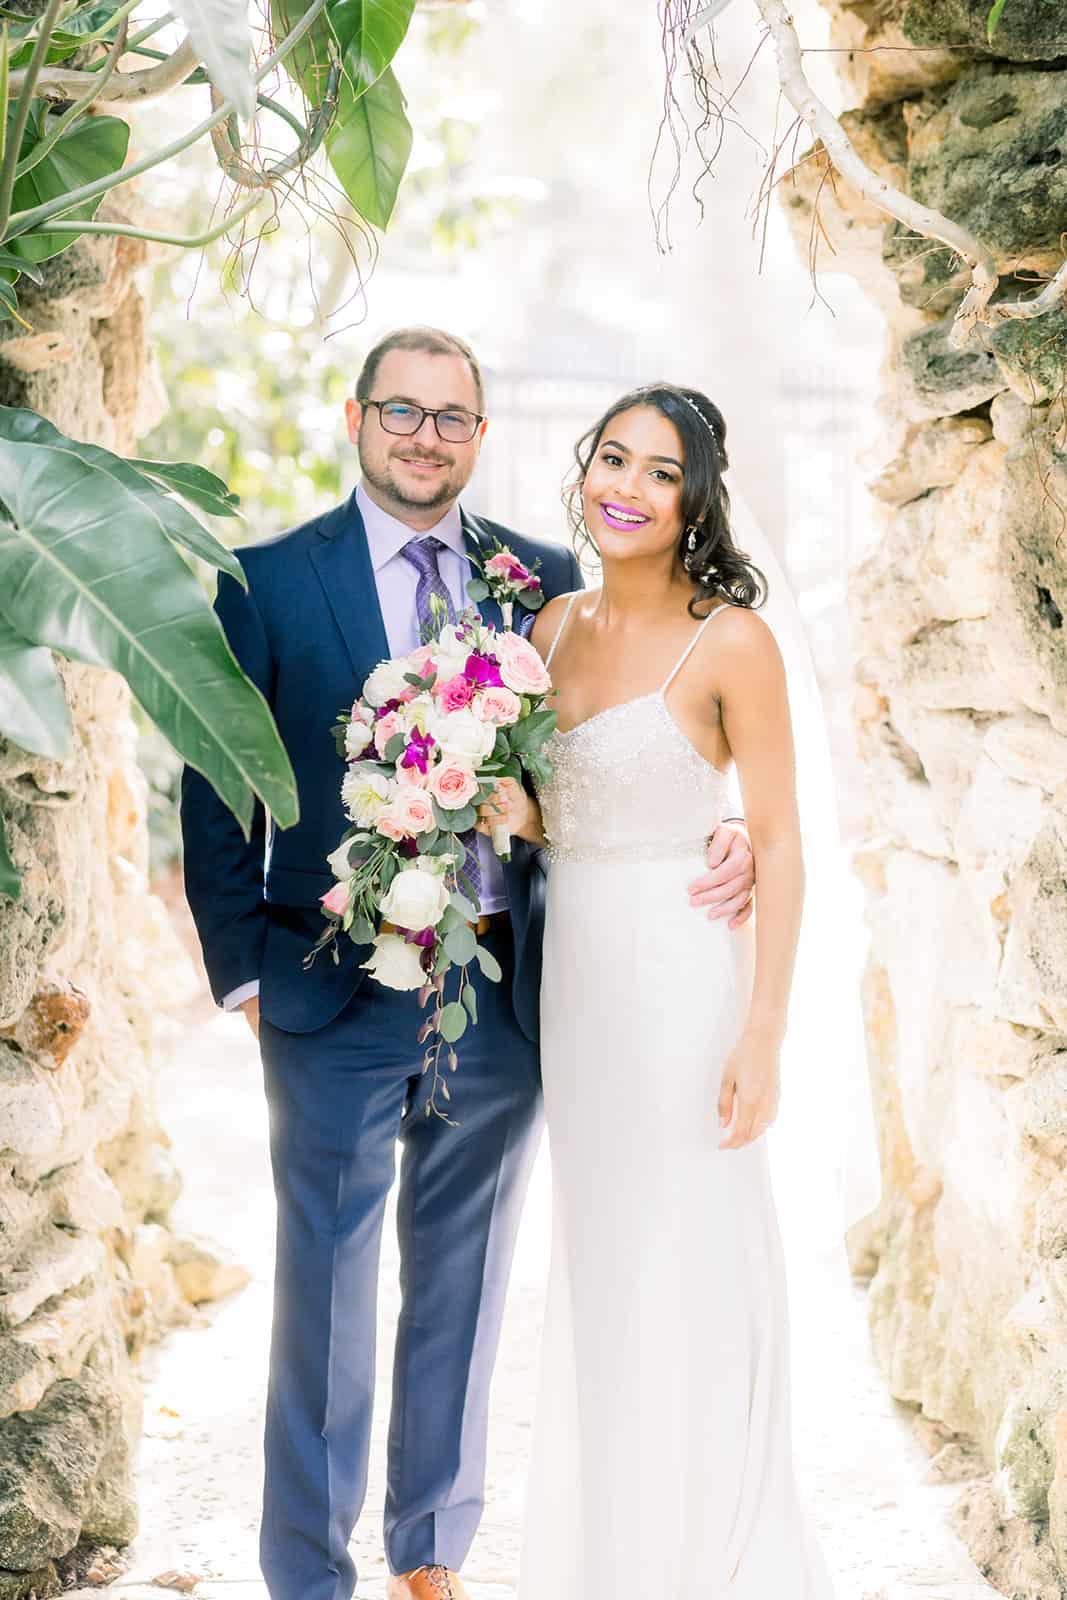 My Wedding Photos   First Look